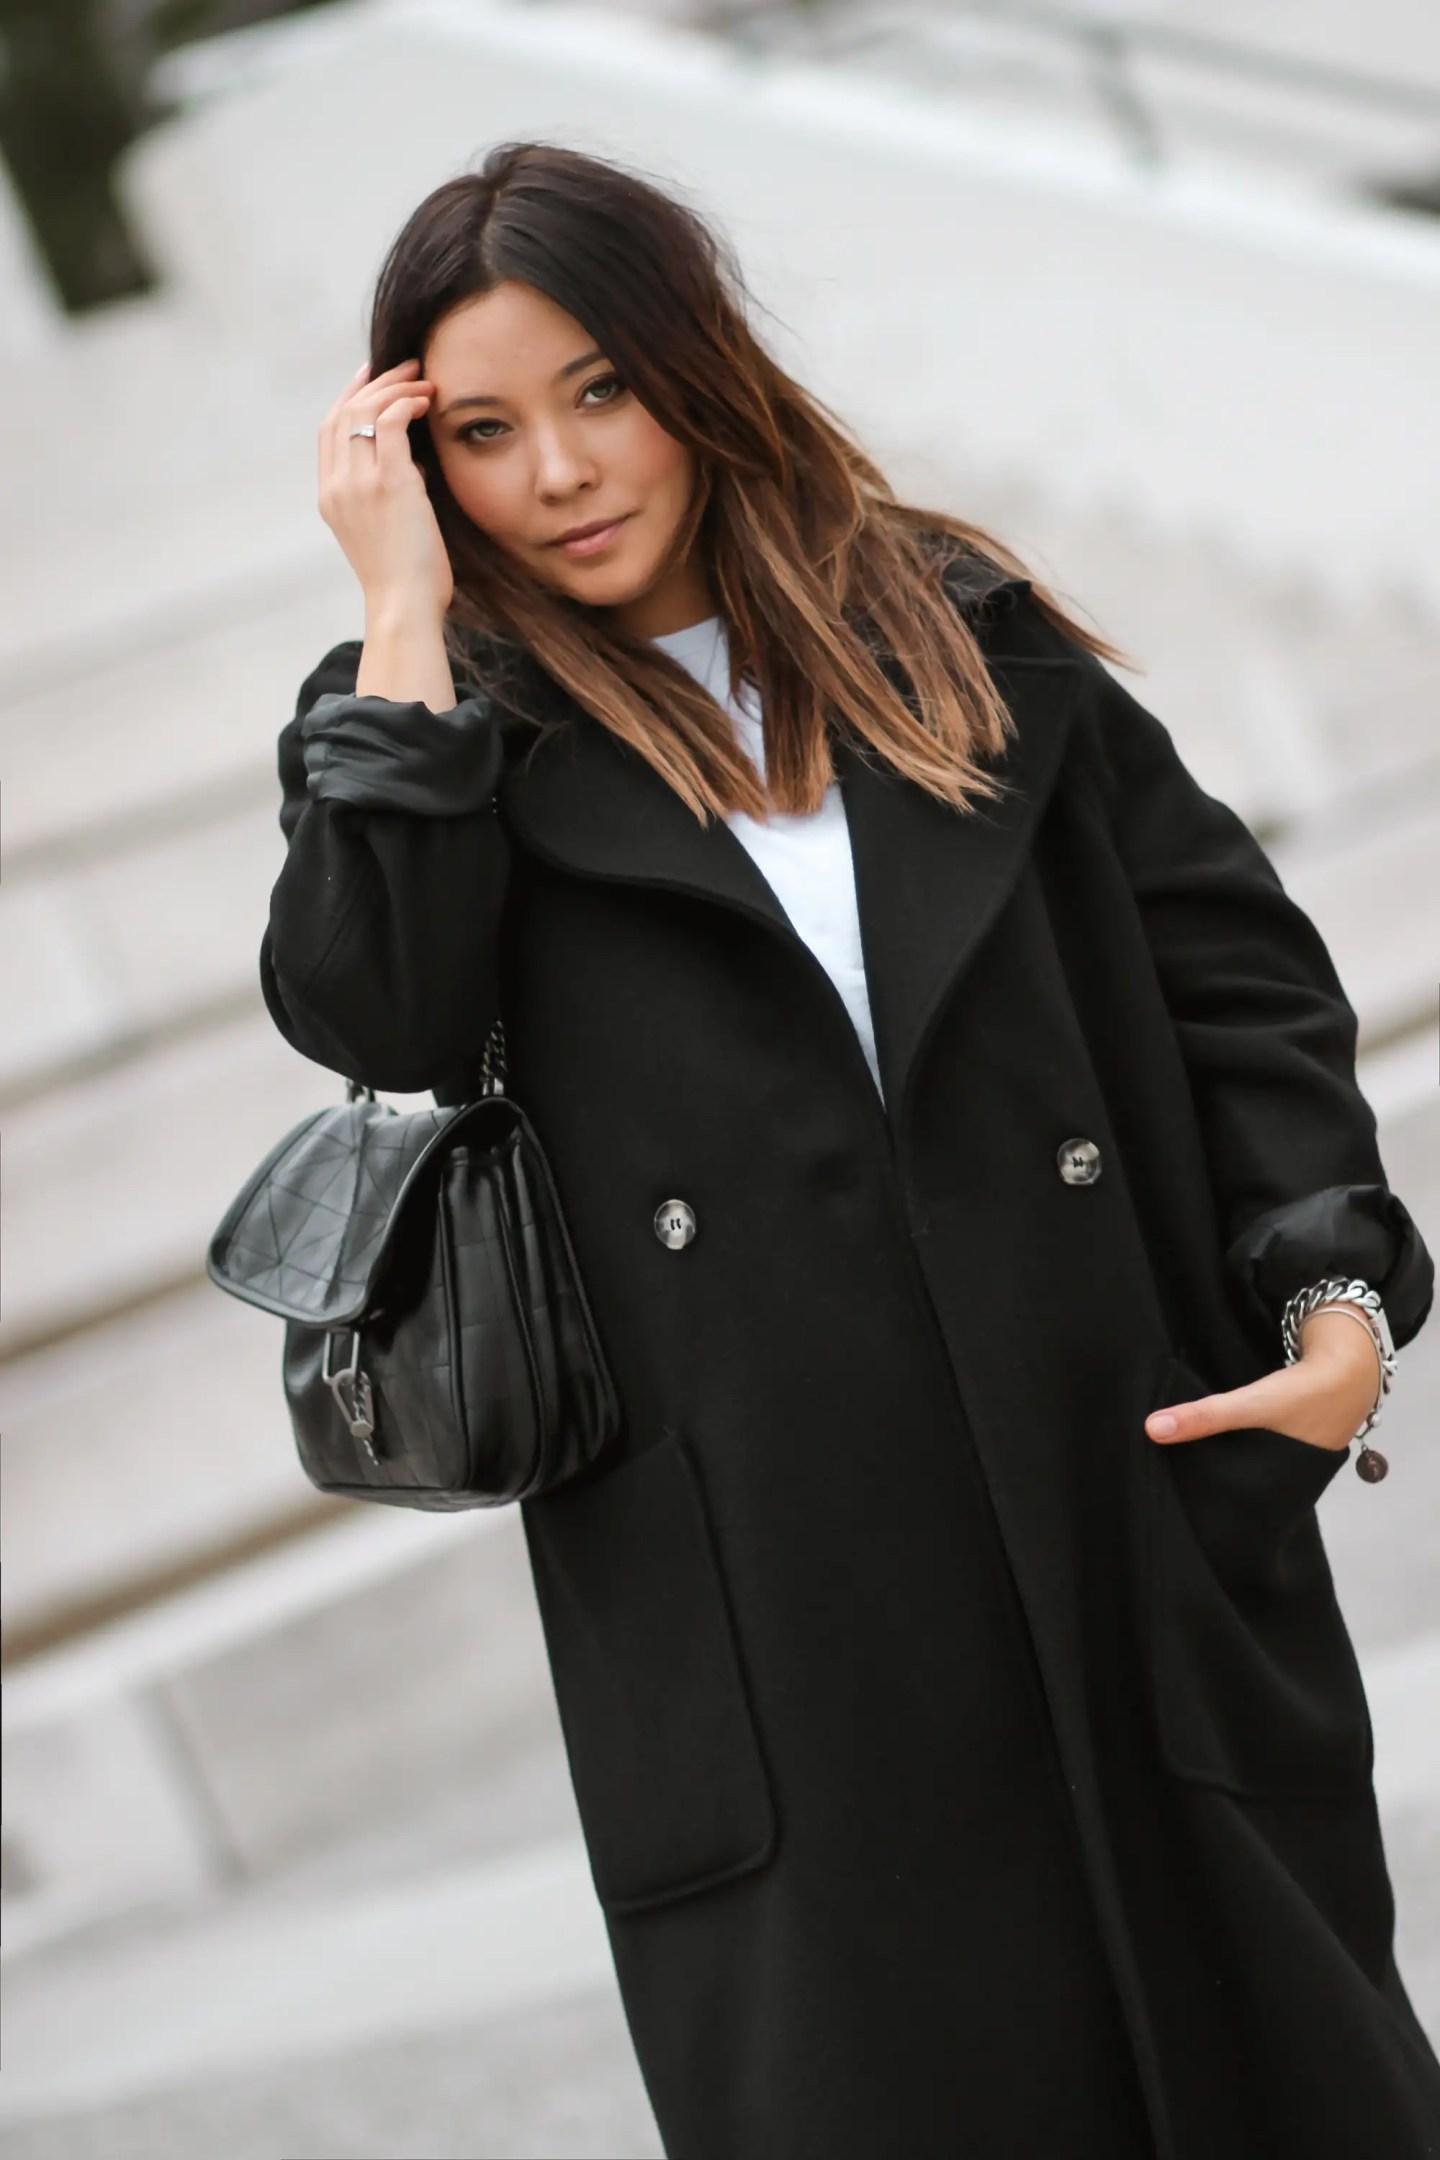 blogueuse mode, manteau noir hm, sac inspi ysl, sac zara, baggy zara, boots inspi isabel marant, bottines hm, bottines western femme, and other stories, bershka, MANTEAU NOIR LOOSE + BAGGY +BOTTINES H&M INSPI #ISABELMARANT